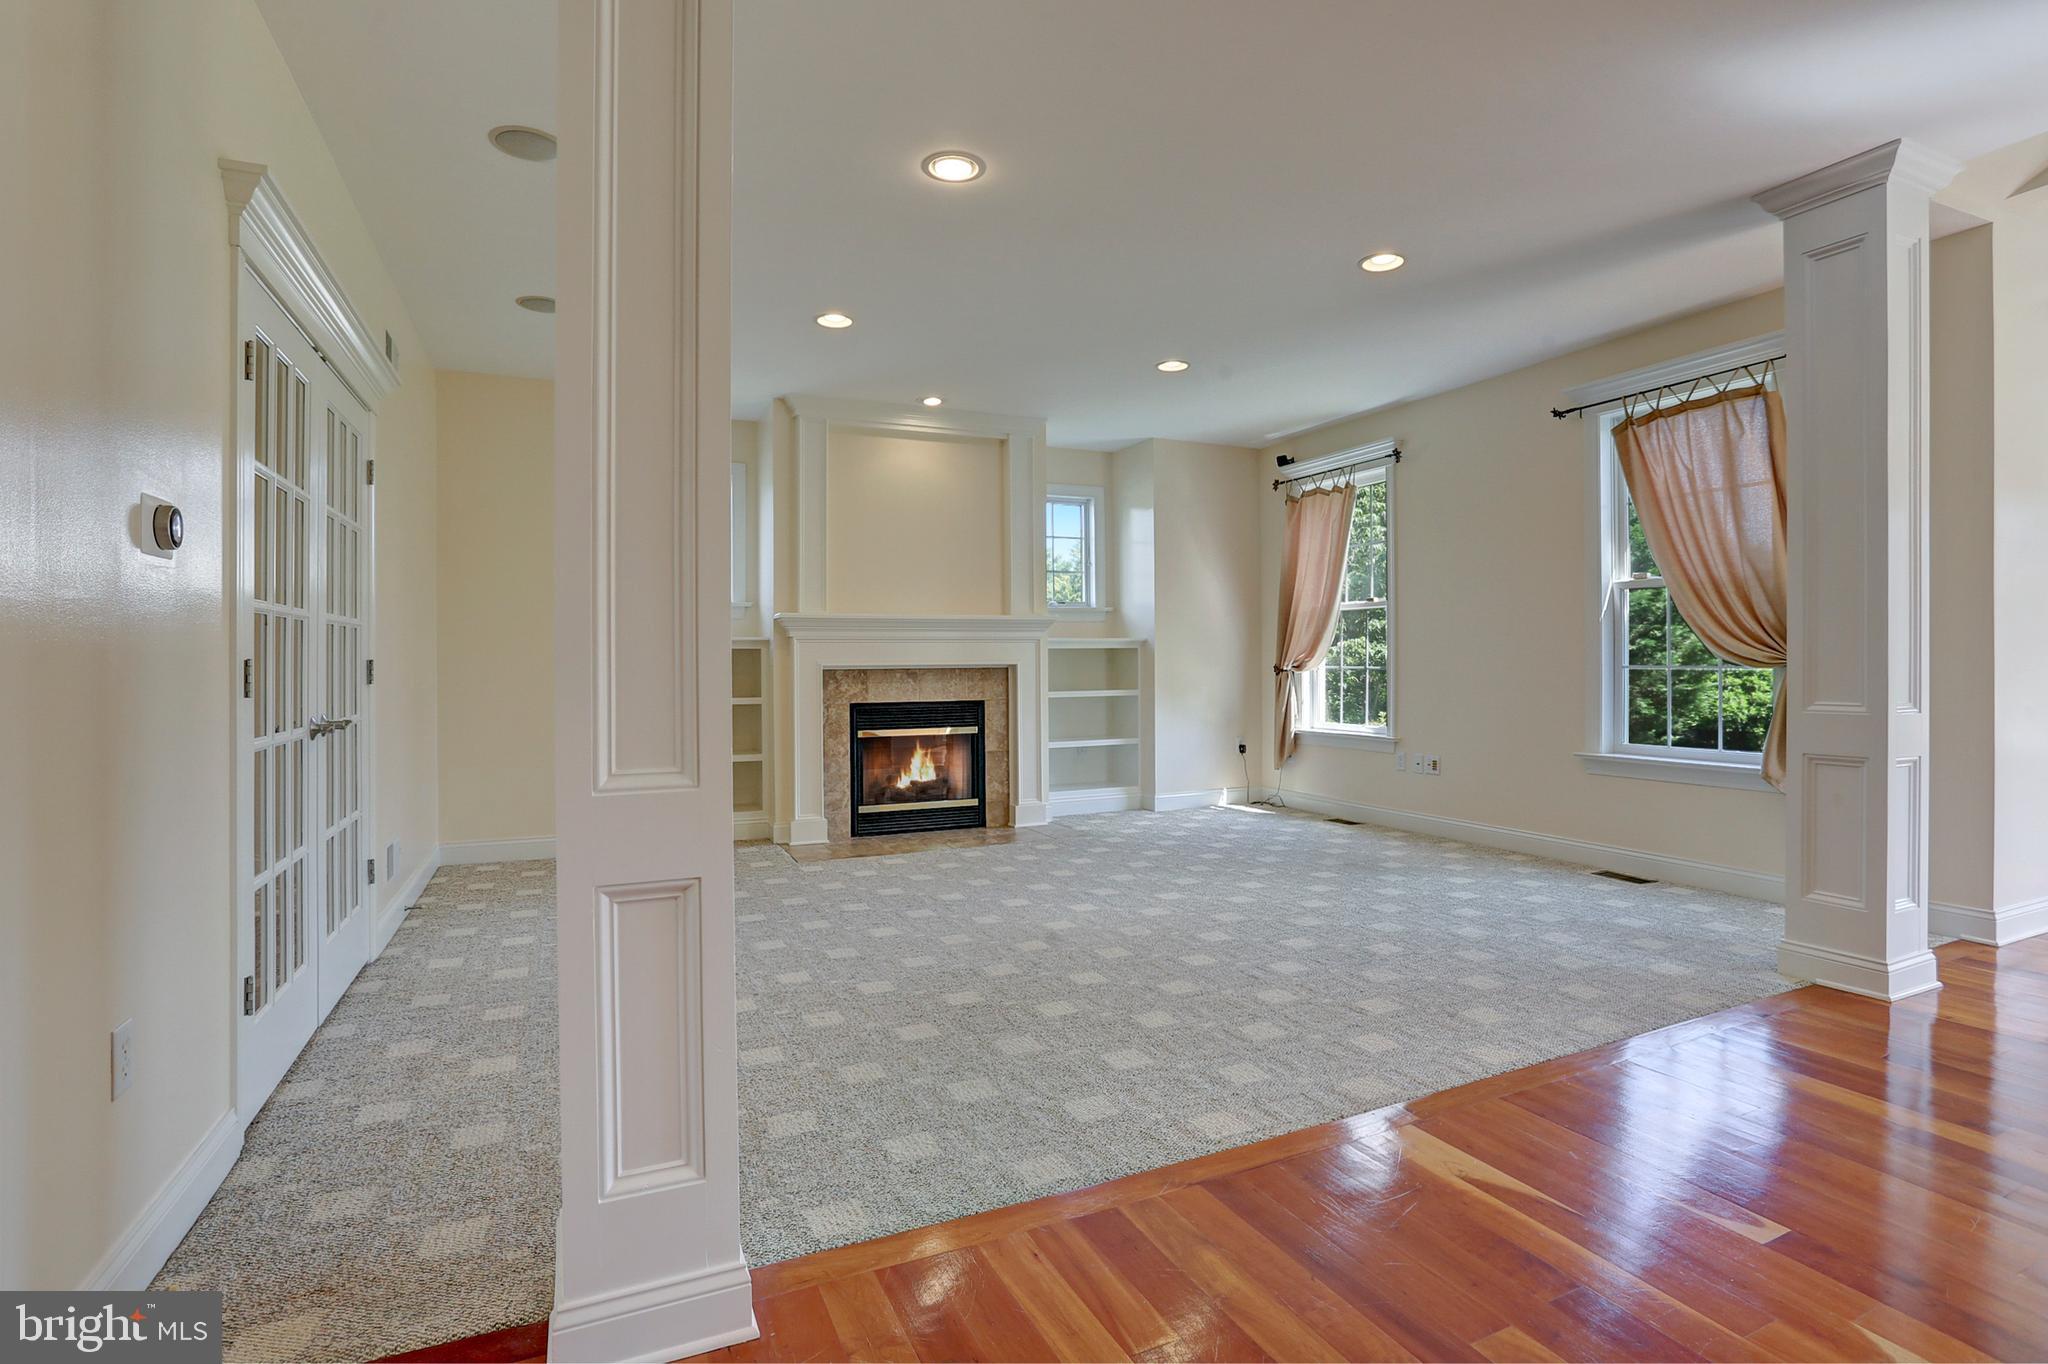 High Ceilings and Beautiful Flooring